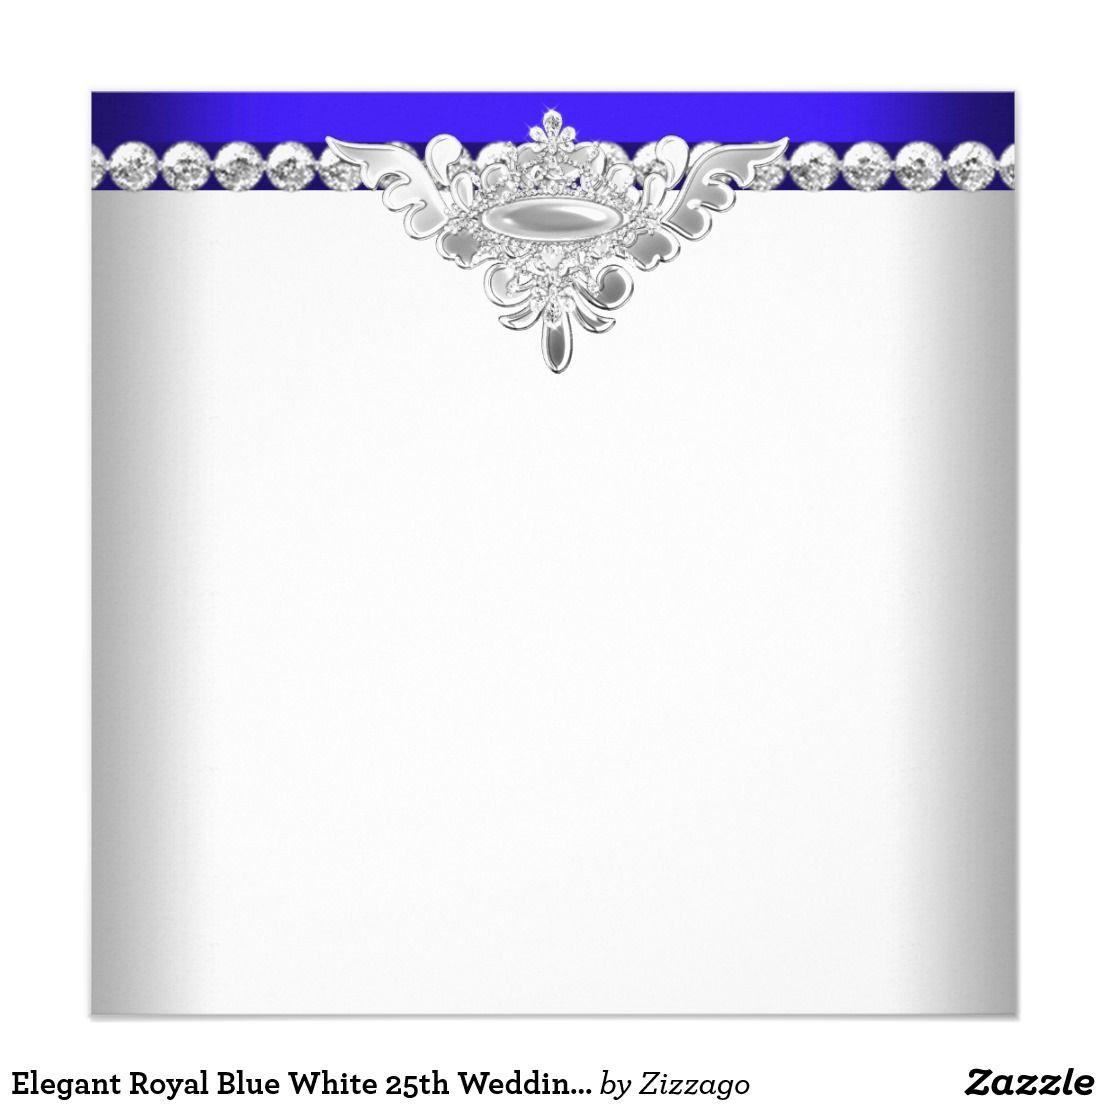 Elegant Royal Blue White 25th Wedding Anniversary Card: Blue And Silver Elegant Wedding Invitations At Websimilar.org